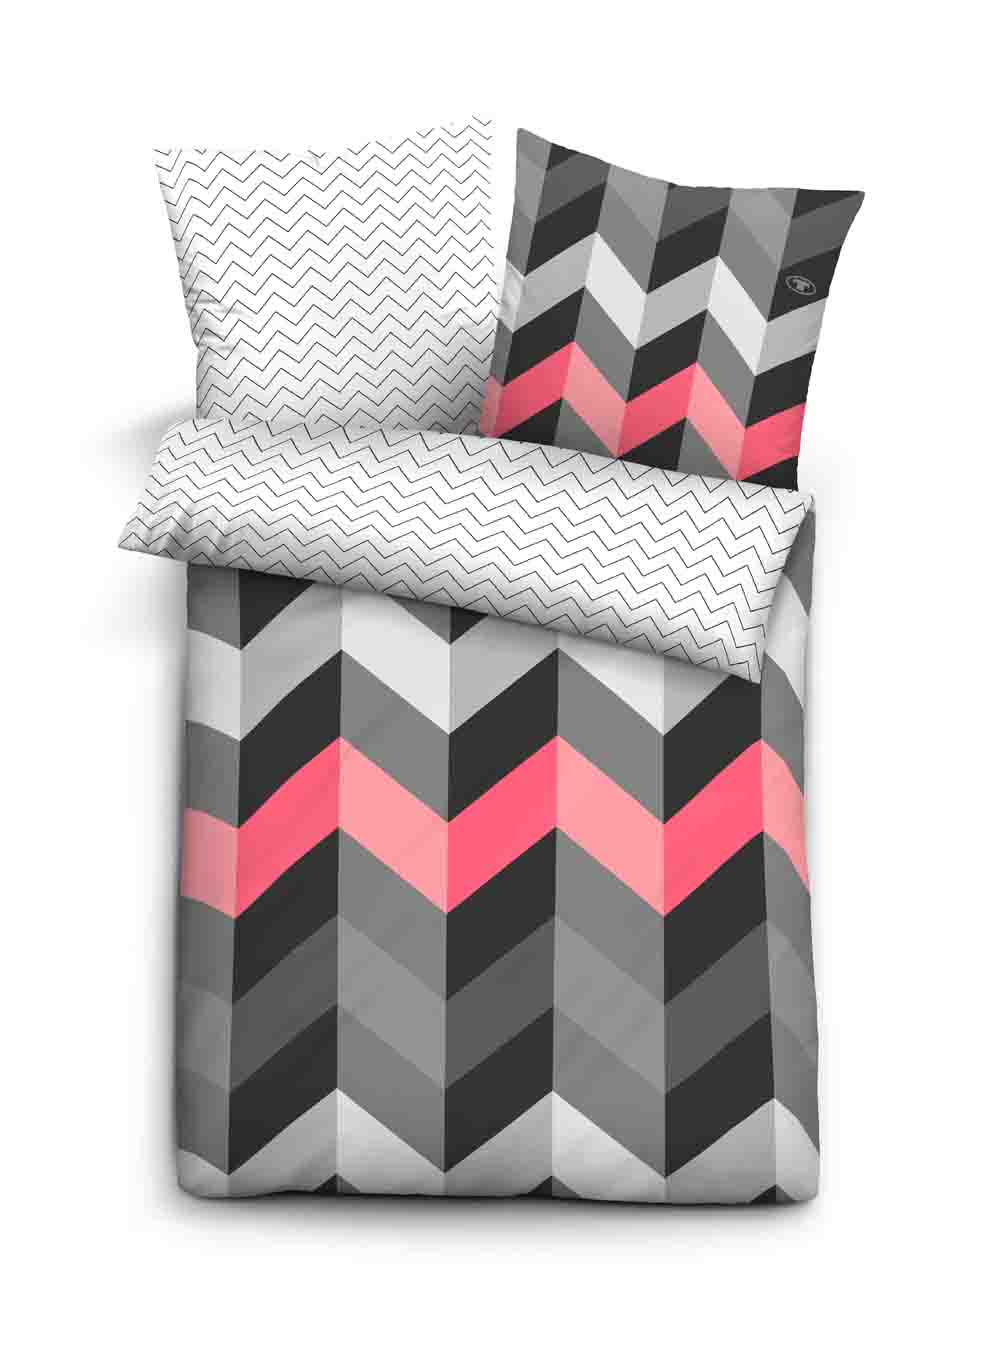 tom tailor satin bettw sche 135x200 cm grau rosa. Black Bedroom Furniture Sets. Home Design Ideas